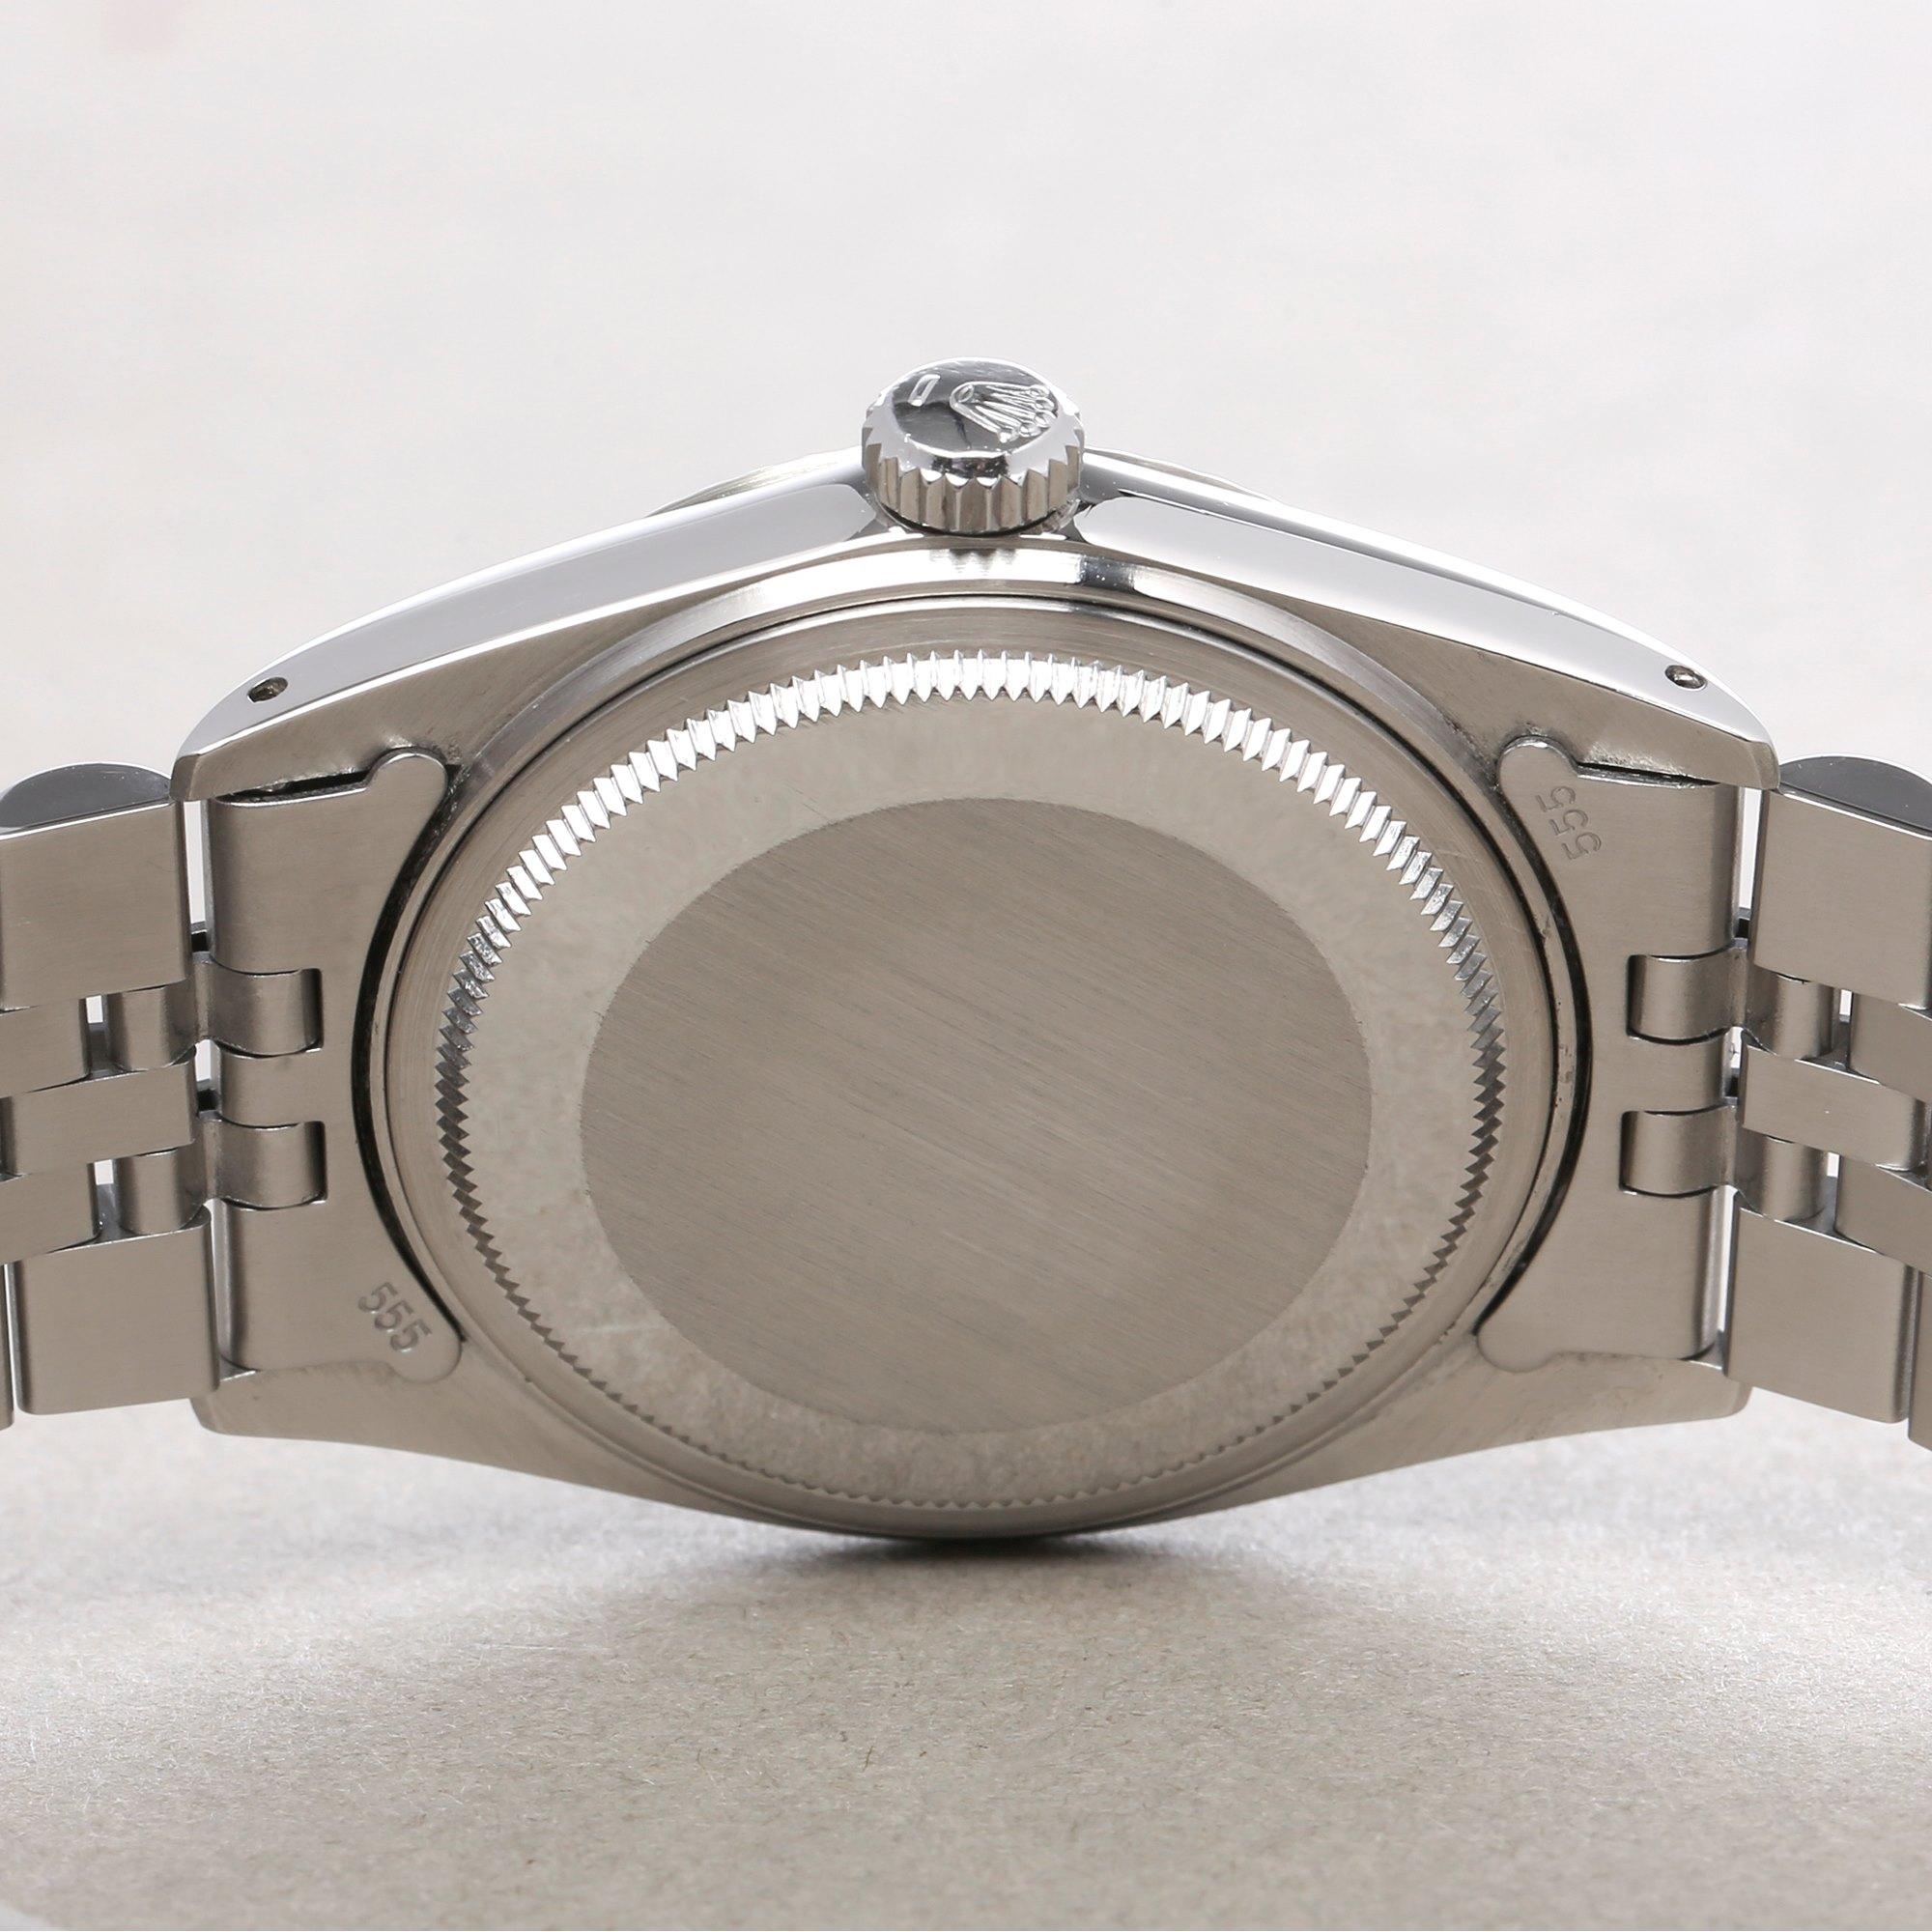 Rolex Datejust 36 18K White Gold & Stainless Steel 16014